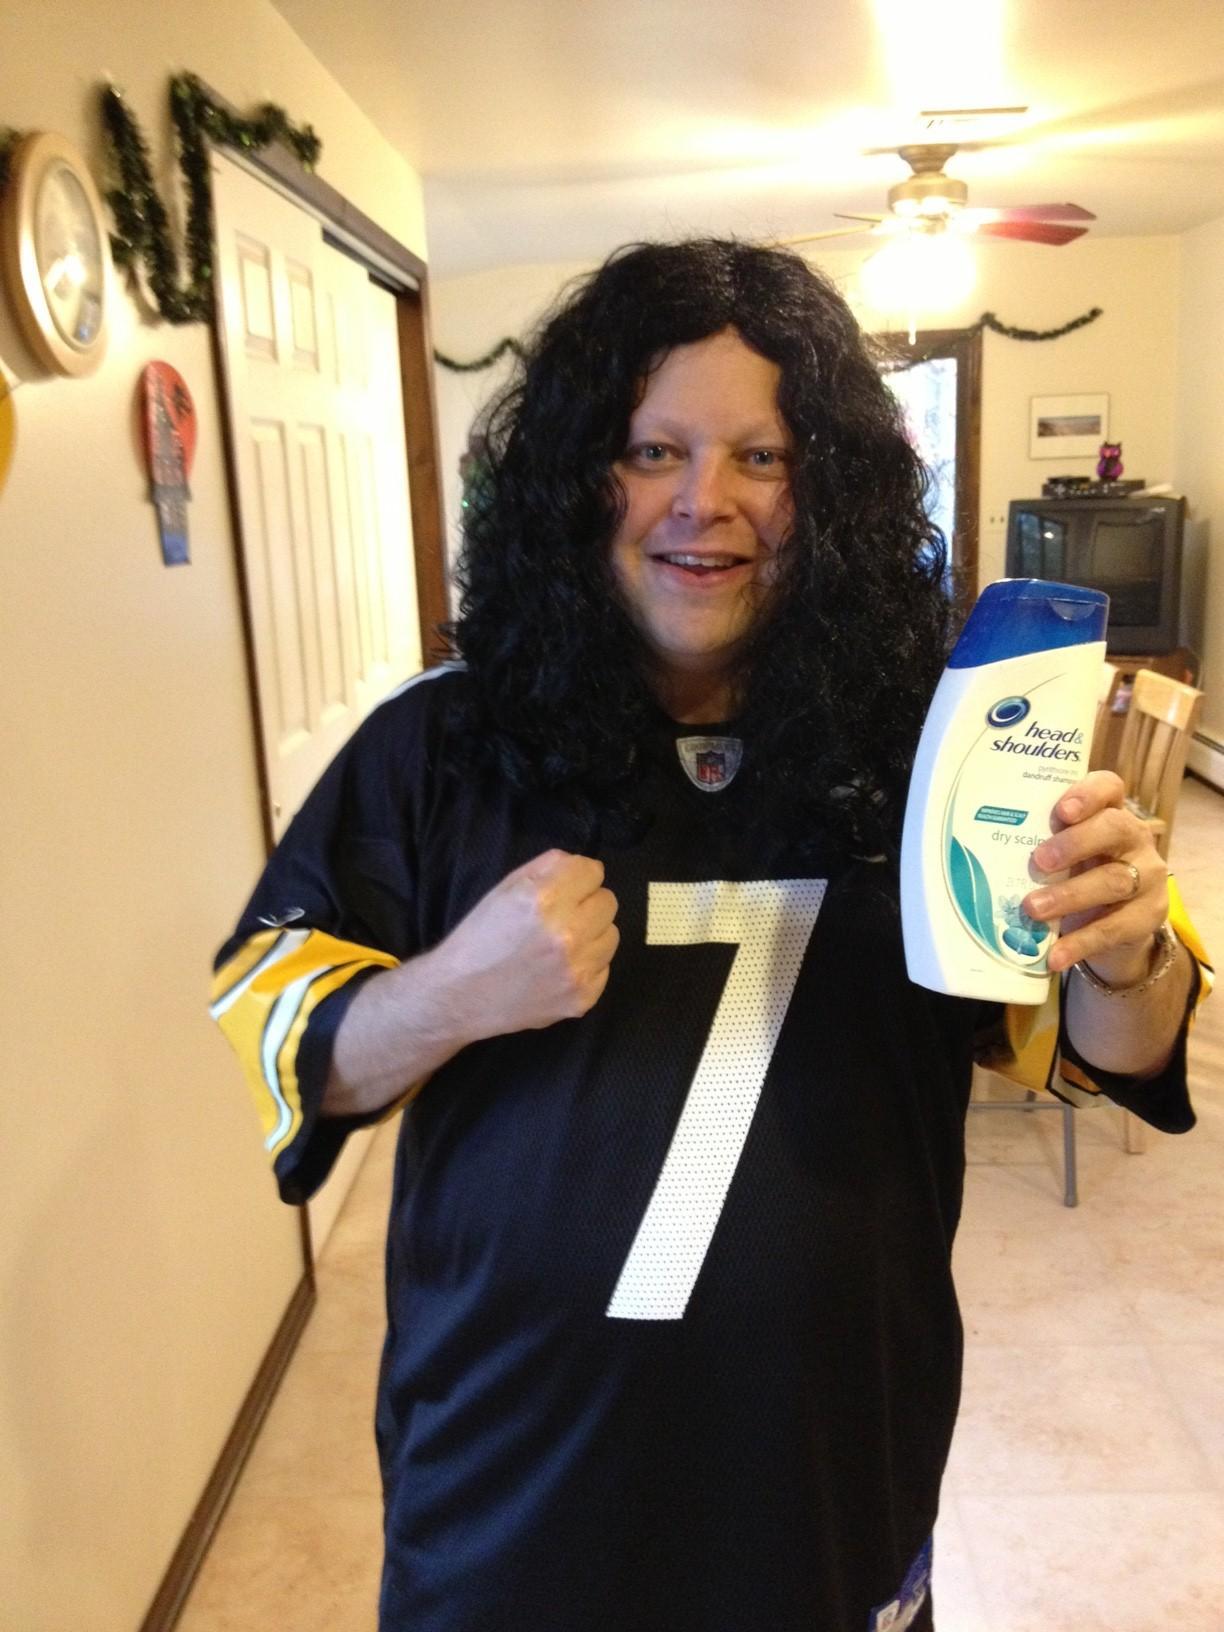 The Best Treat on Halloween - Browns Fan Dresses Up As Troy Polamalu